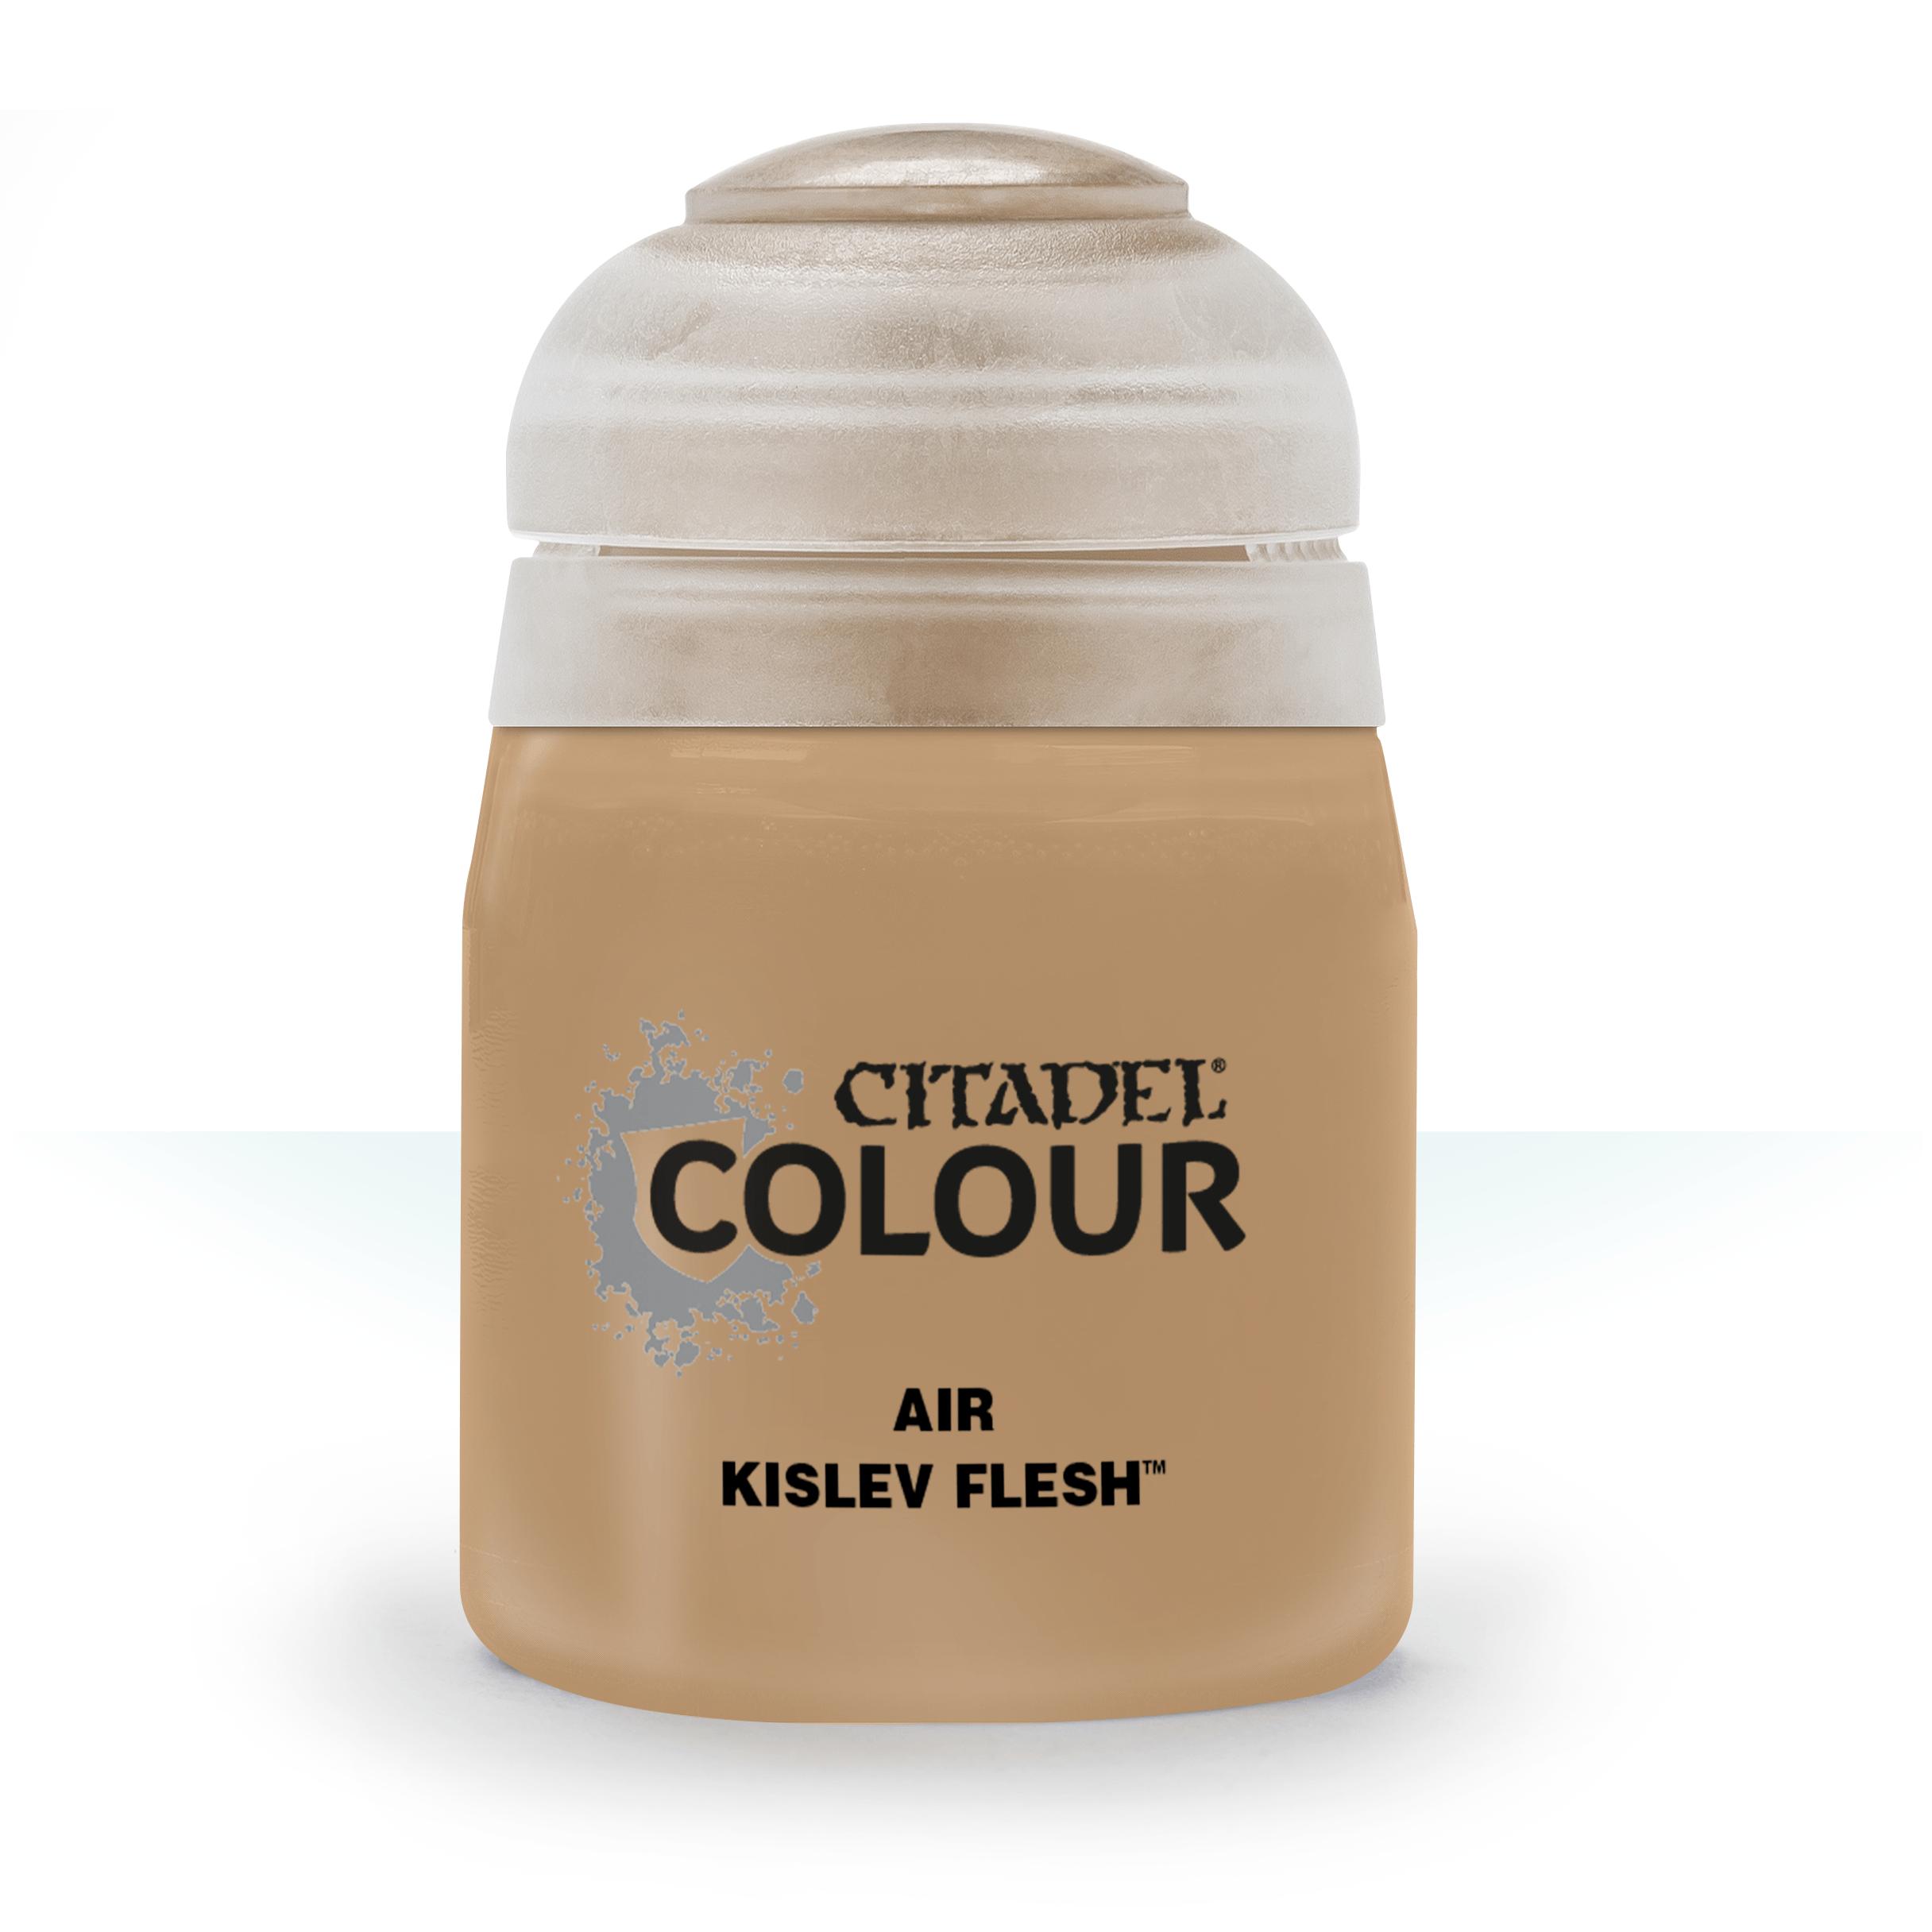 Kislev Flesh, Citadel Air 24ml